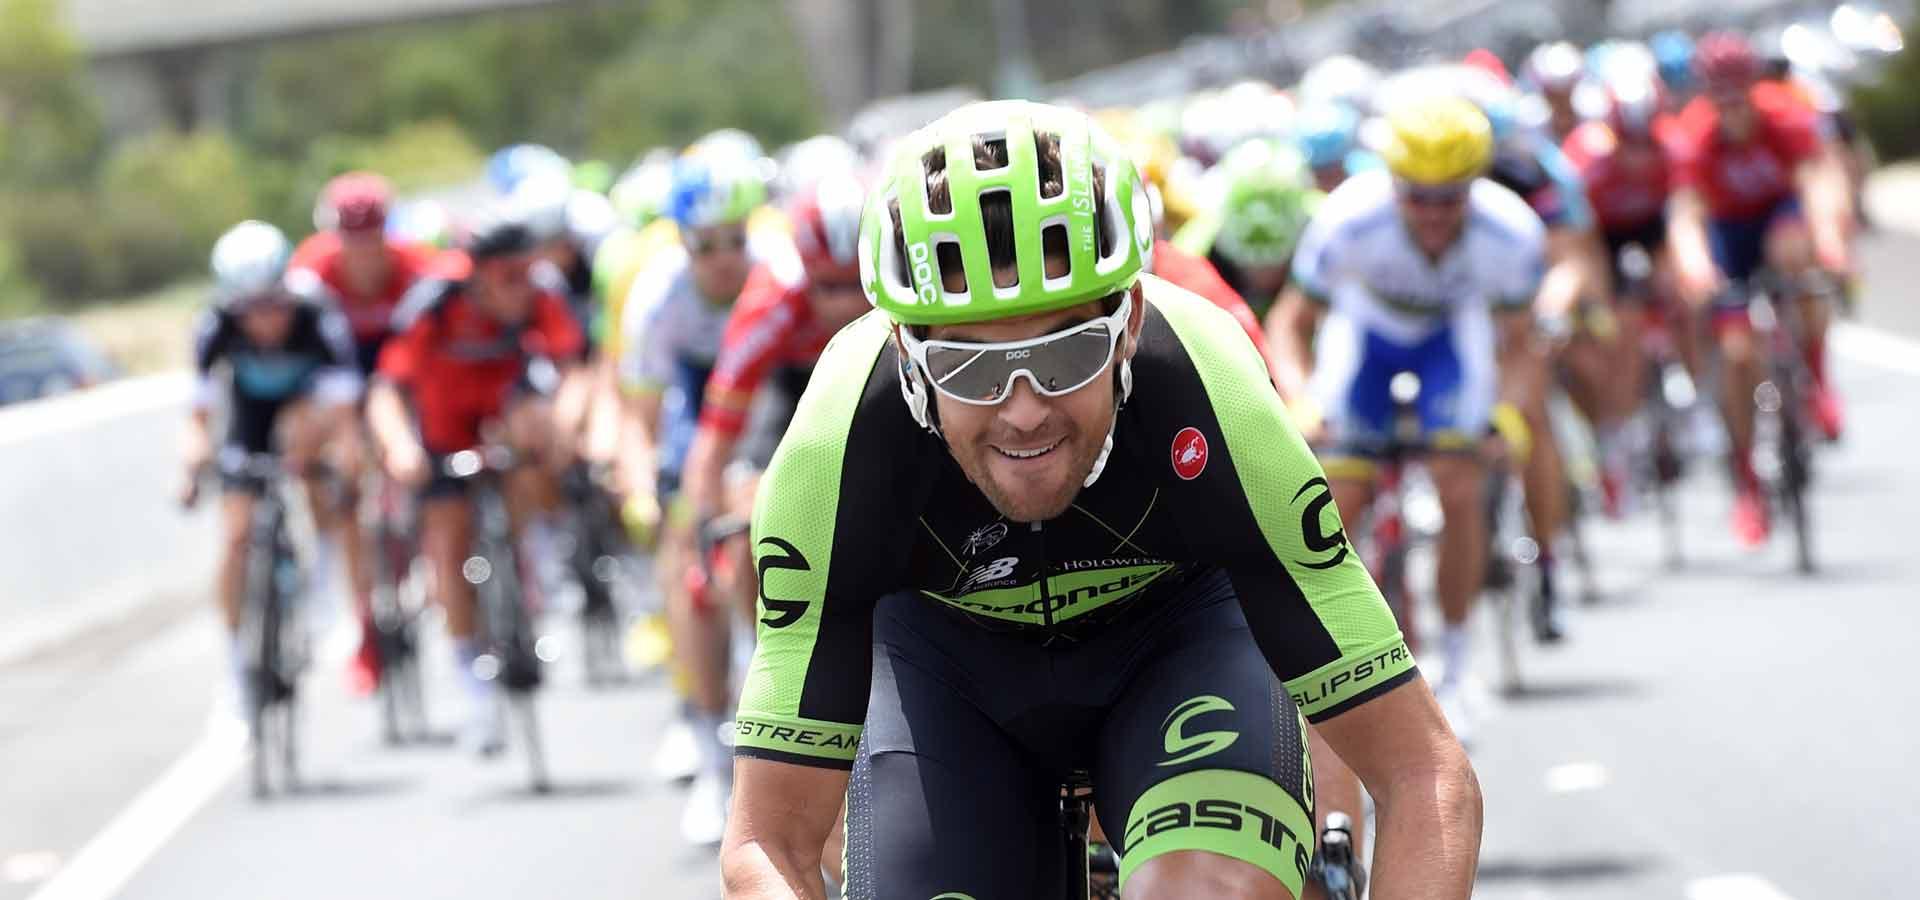 Cannondale-Garmin Pro Cycling 2015